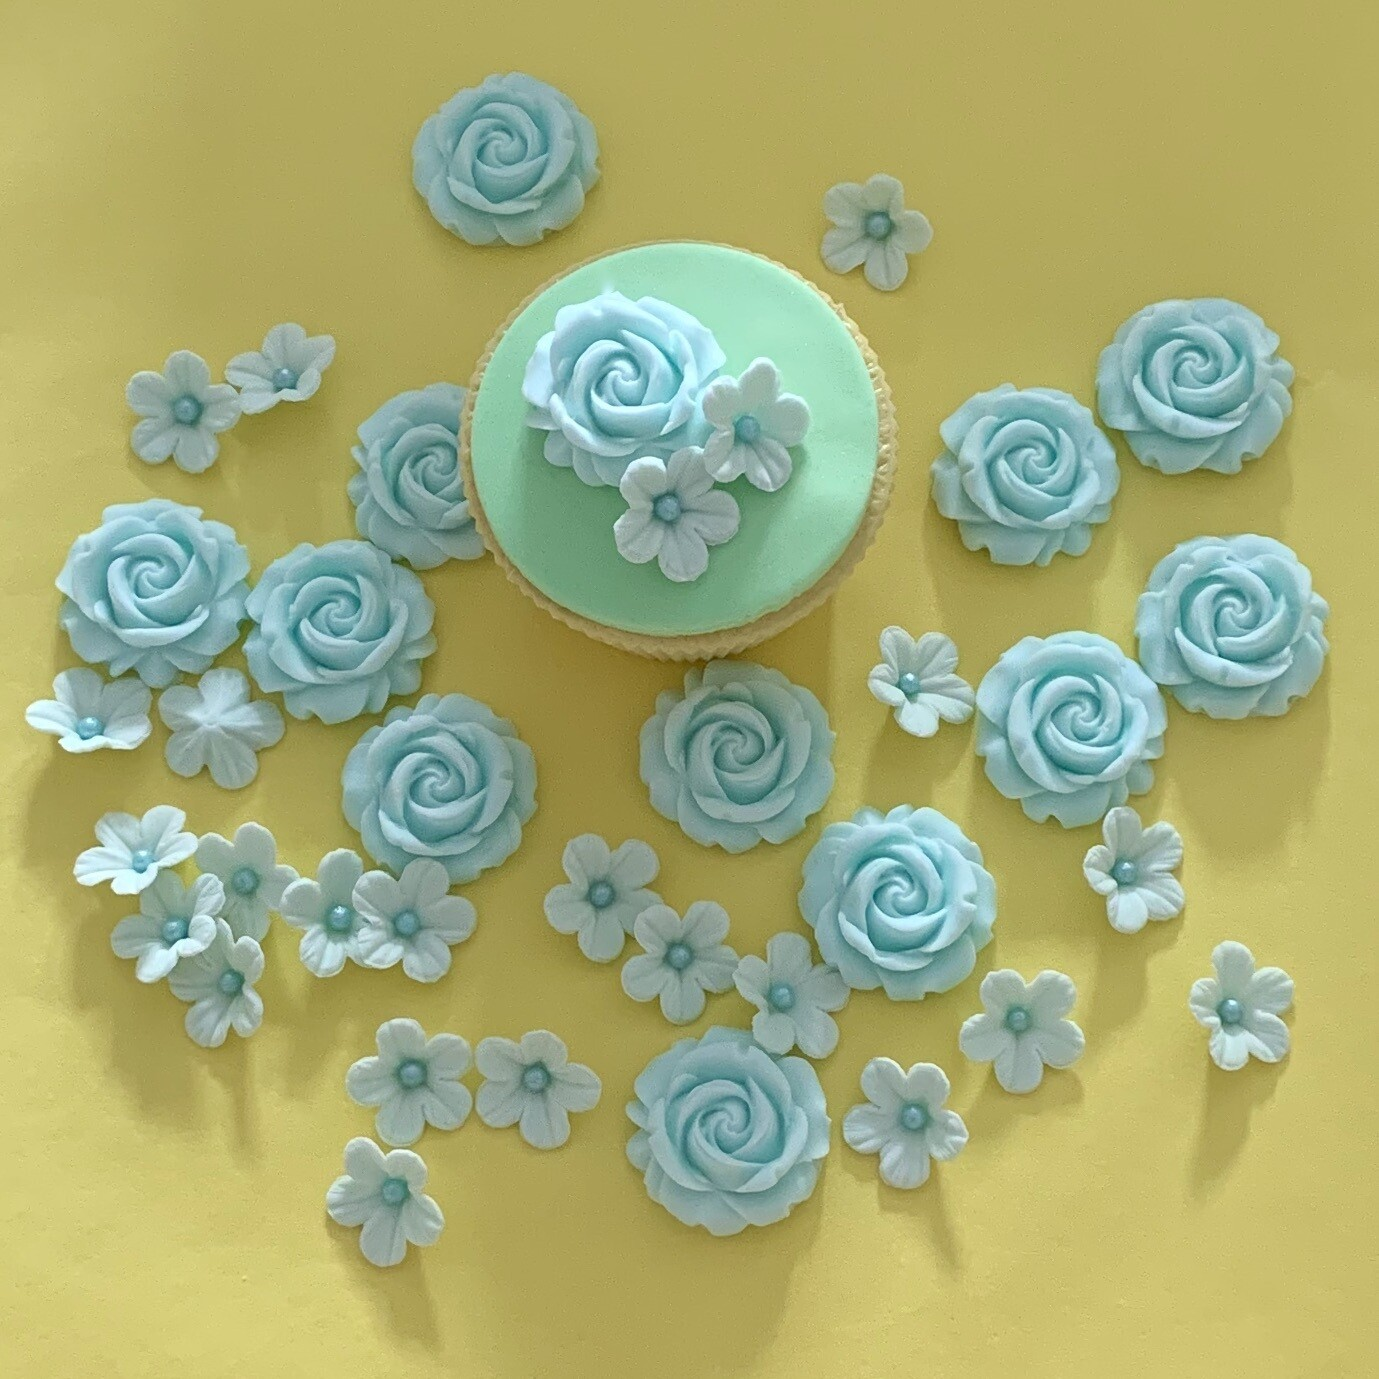 Blue Blush Rose Mix